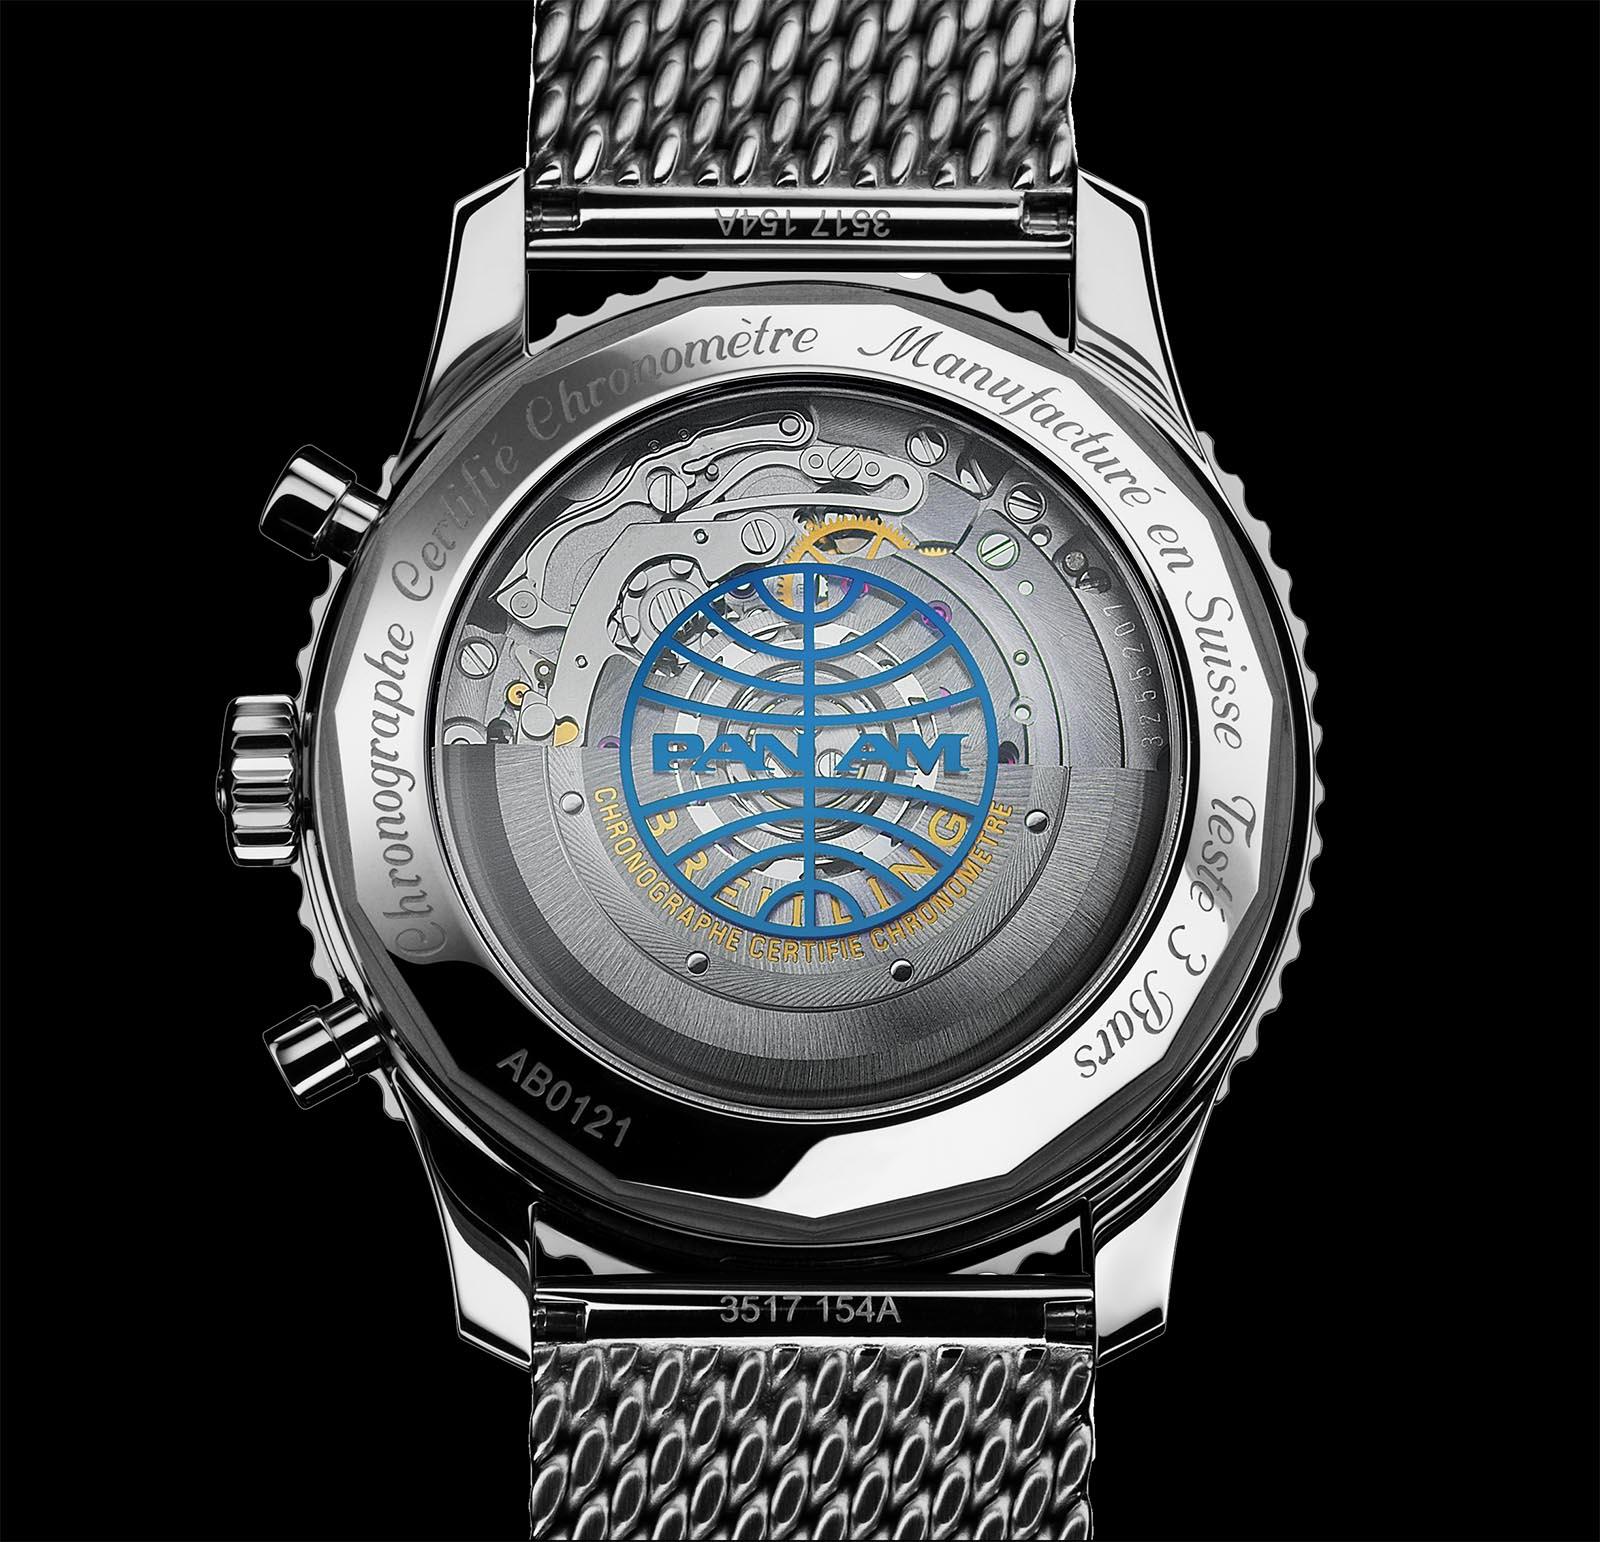 Breitling Navitimer 1 B01 Chronograph 43 Pan Am Edition 2